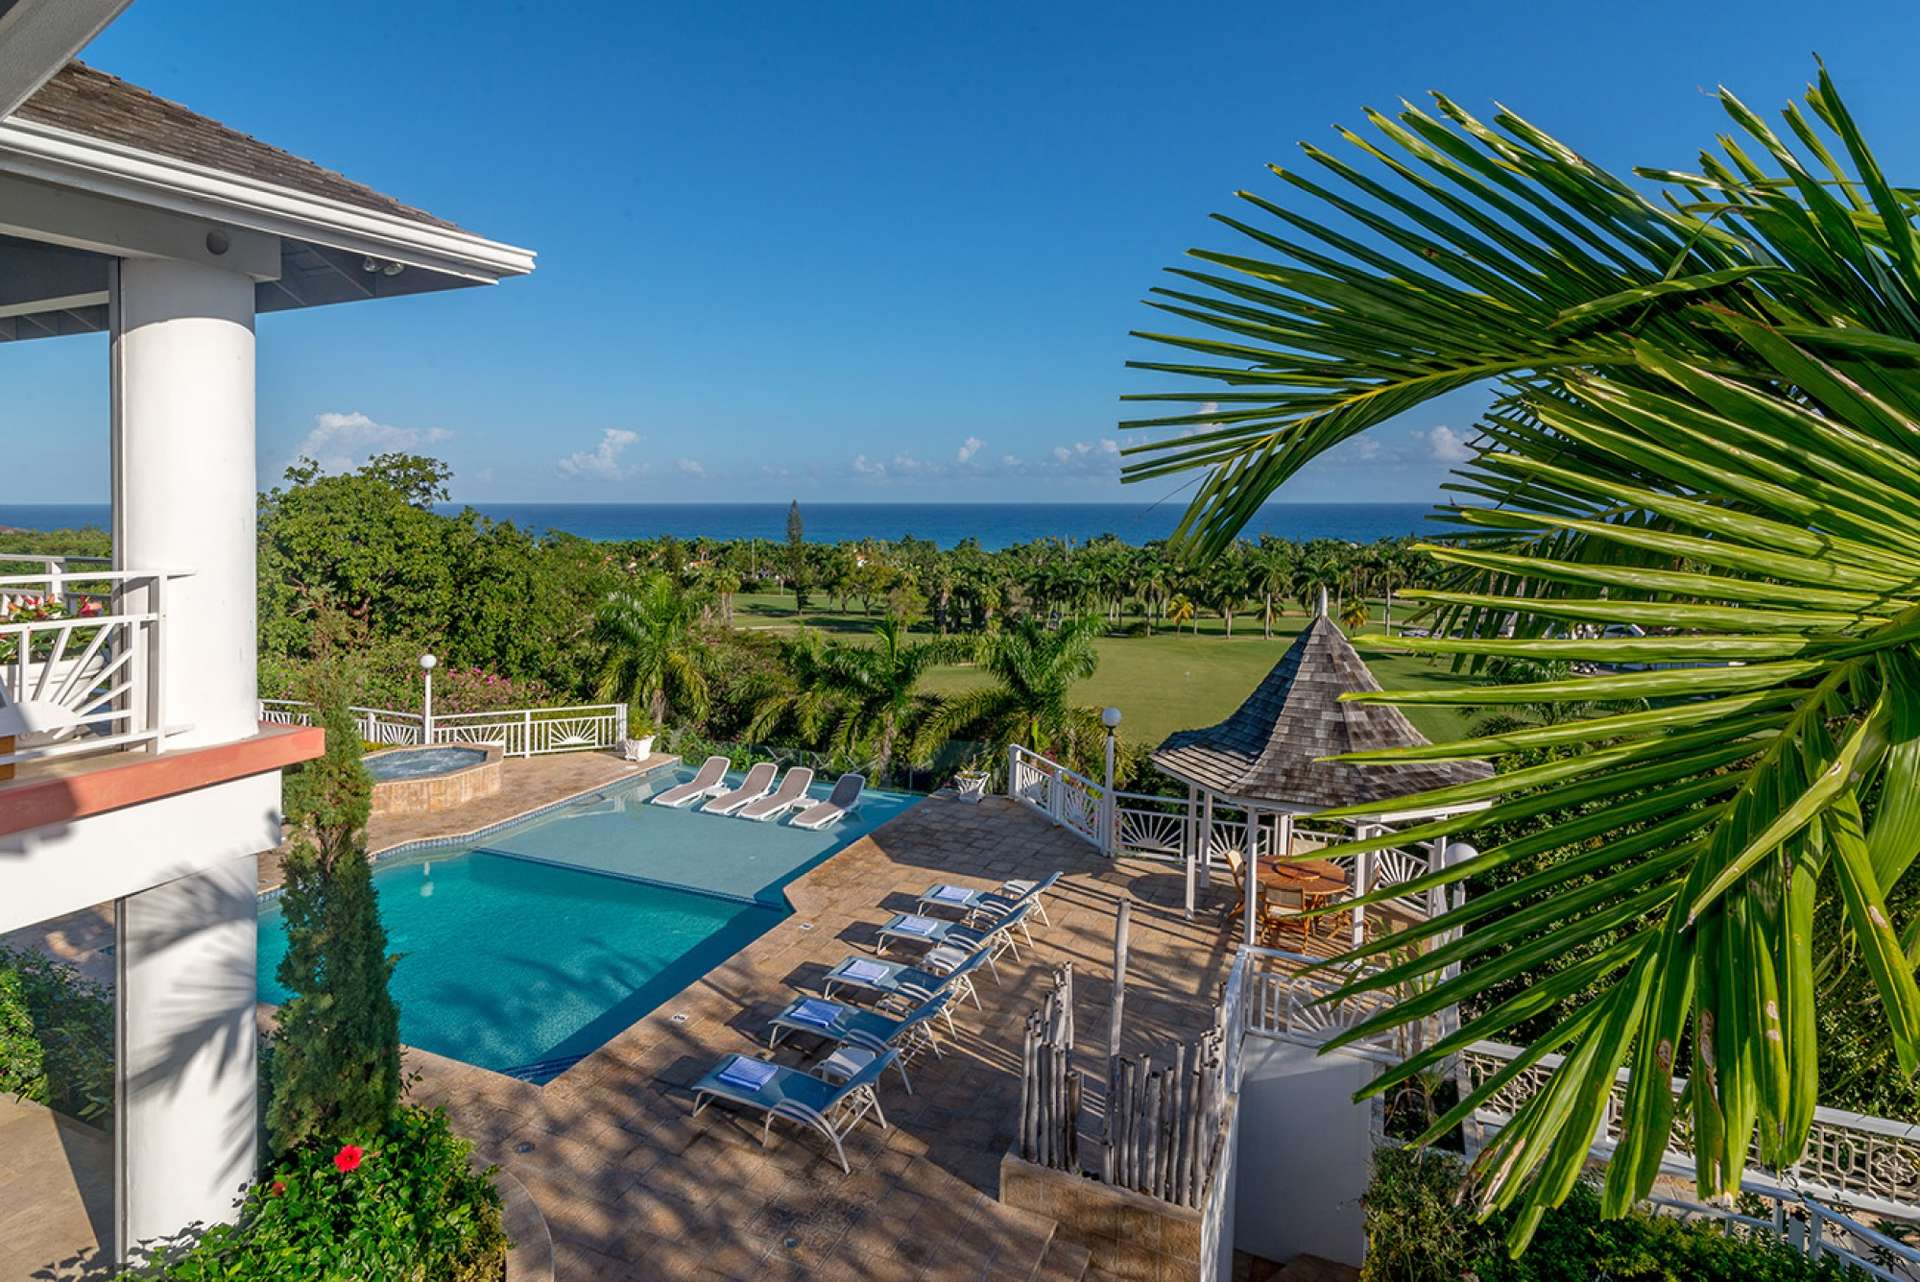 Luxury villa rentals caribbean - Jamaica - Montego bay - Fairway Manor - Image 1/26